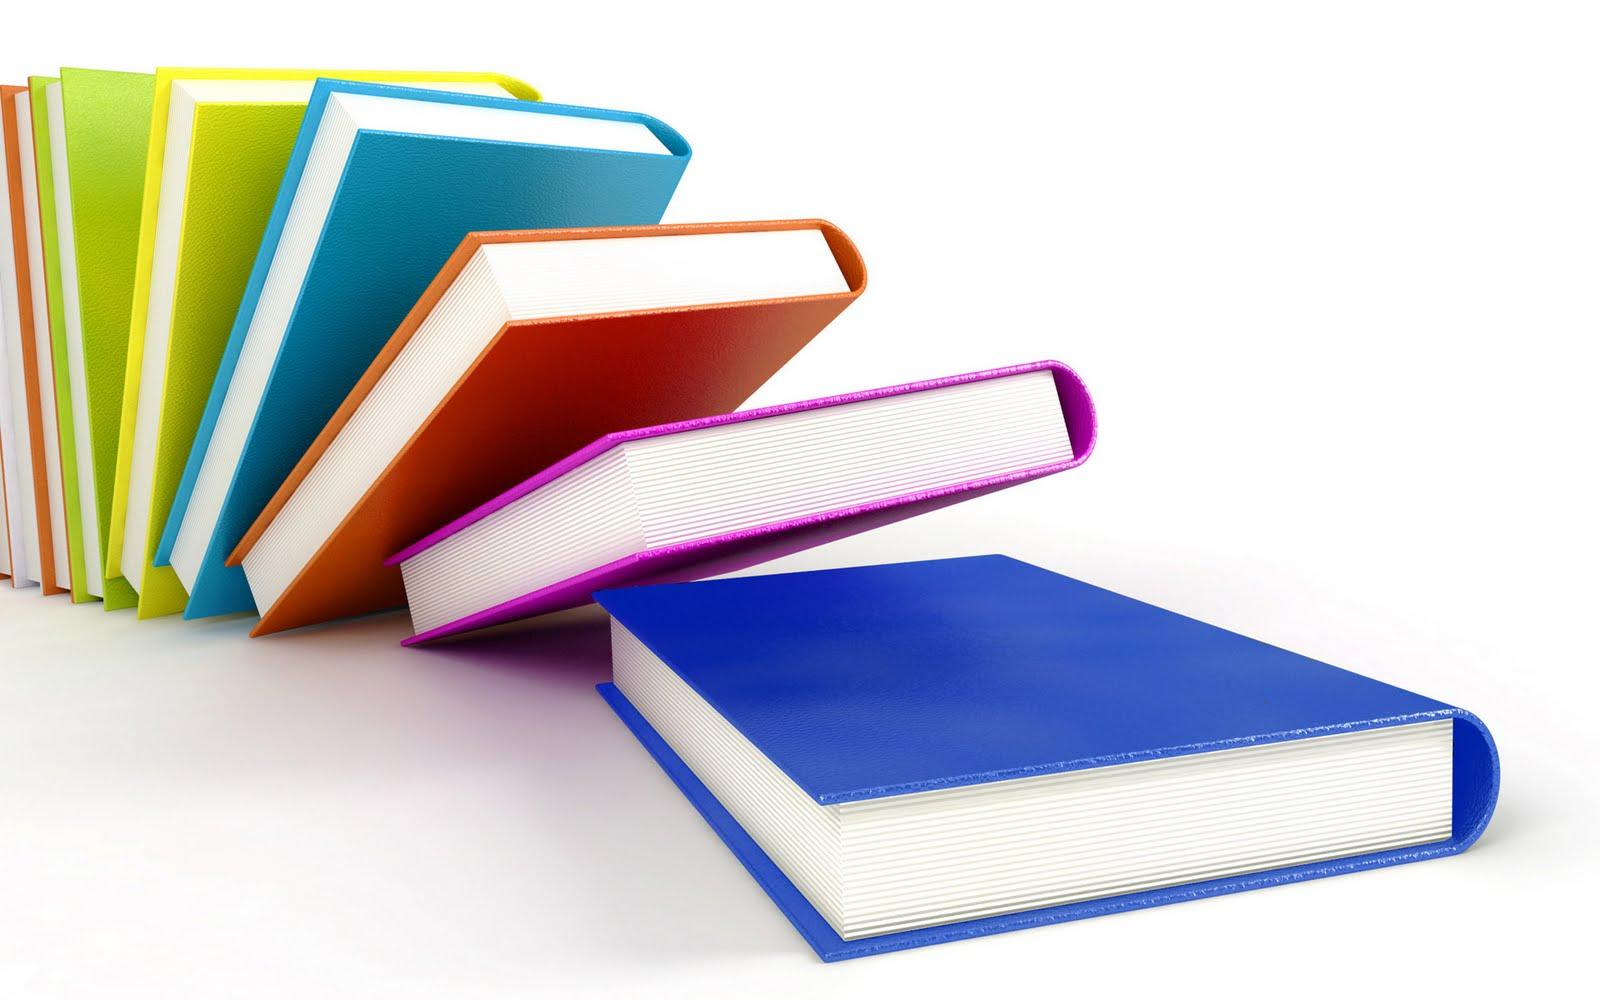 Libros de texto colegio nazaret oviedo - Imagenes de librerias ...